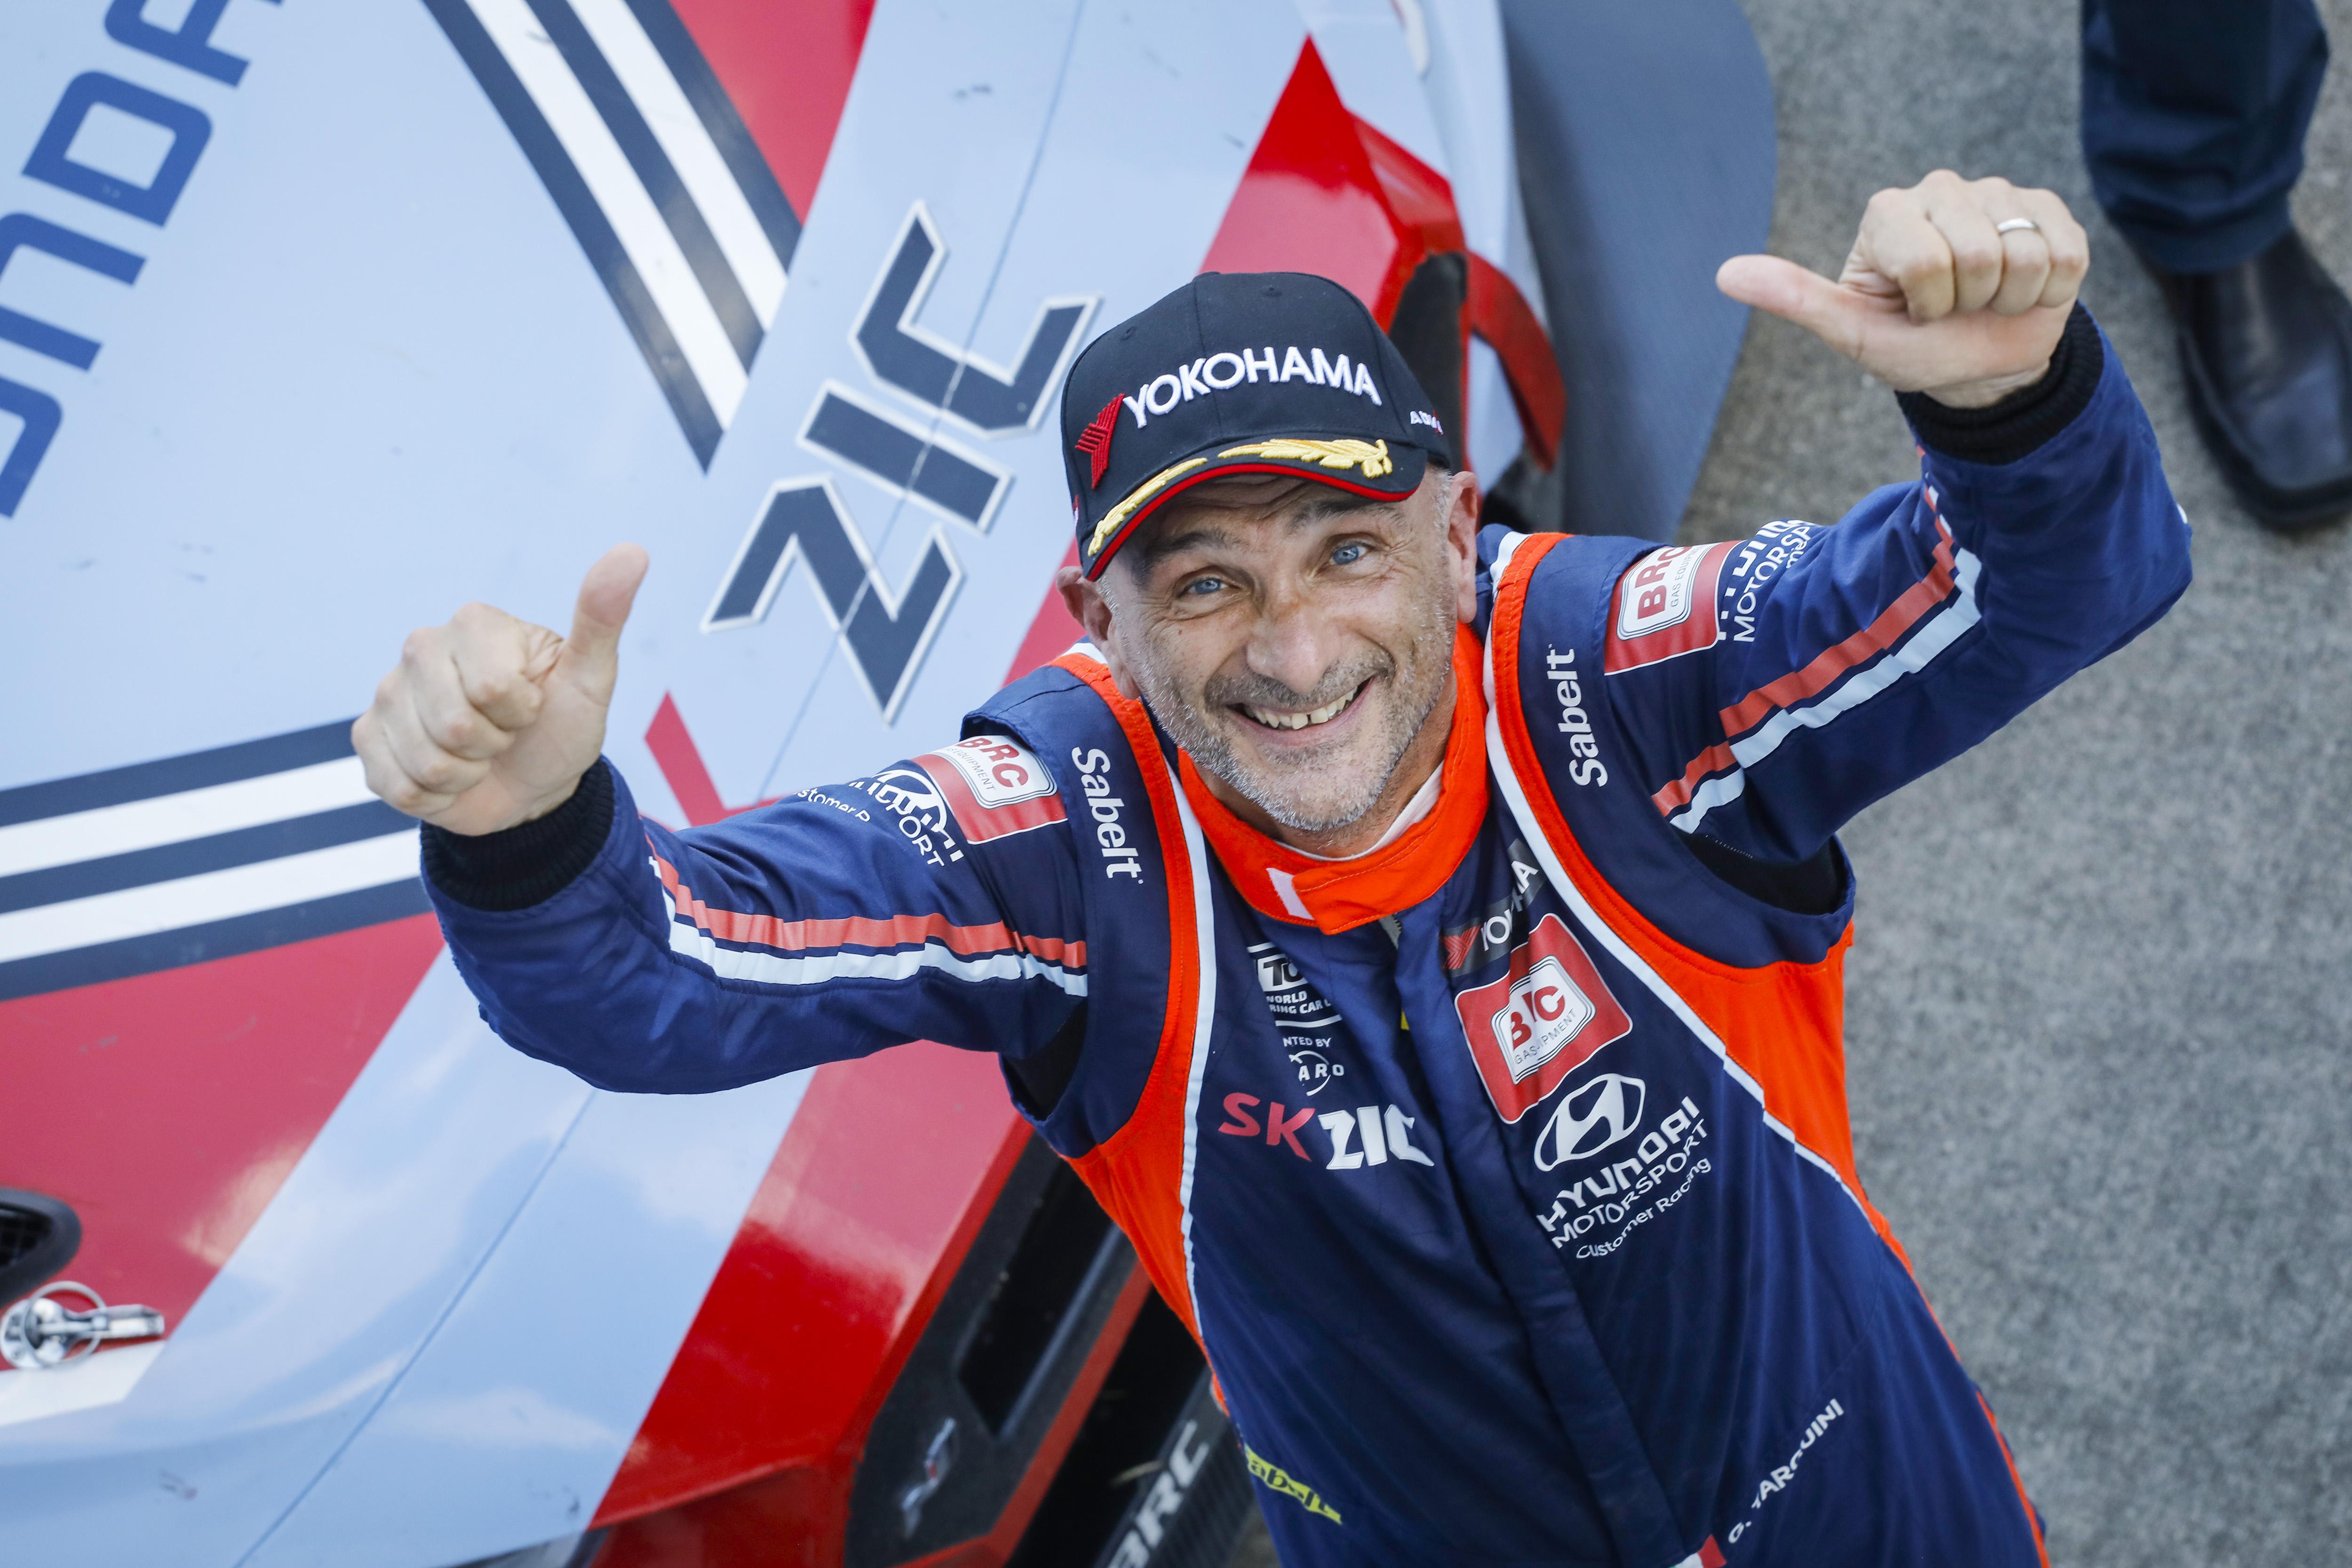 Eilmeldung: Tarquini gewinnt WTCR Titel in Macau*